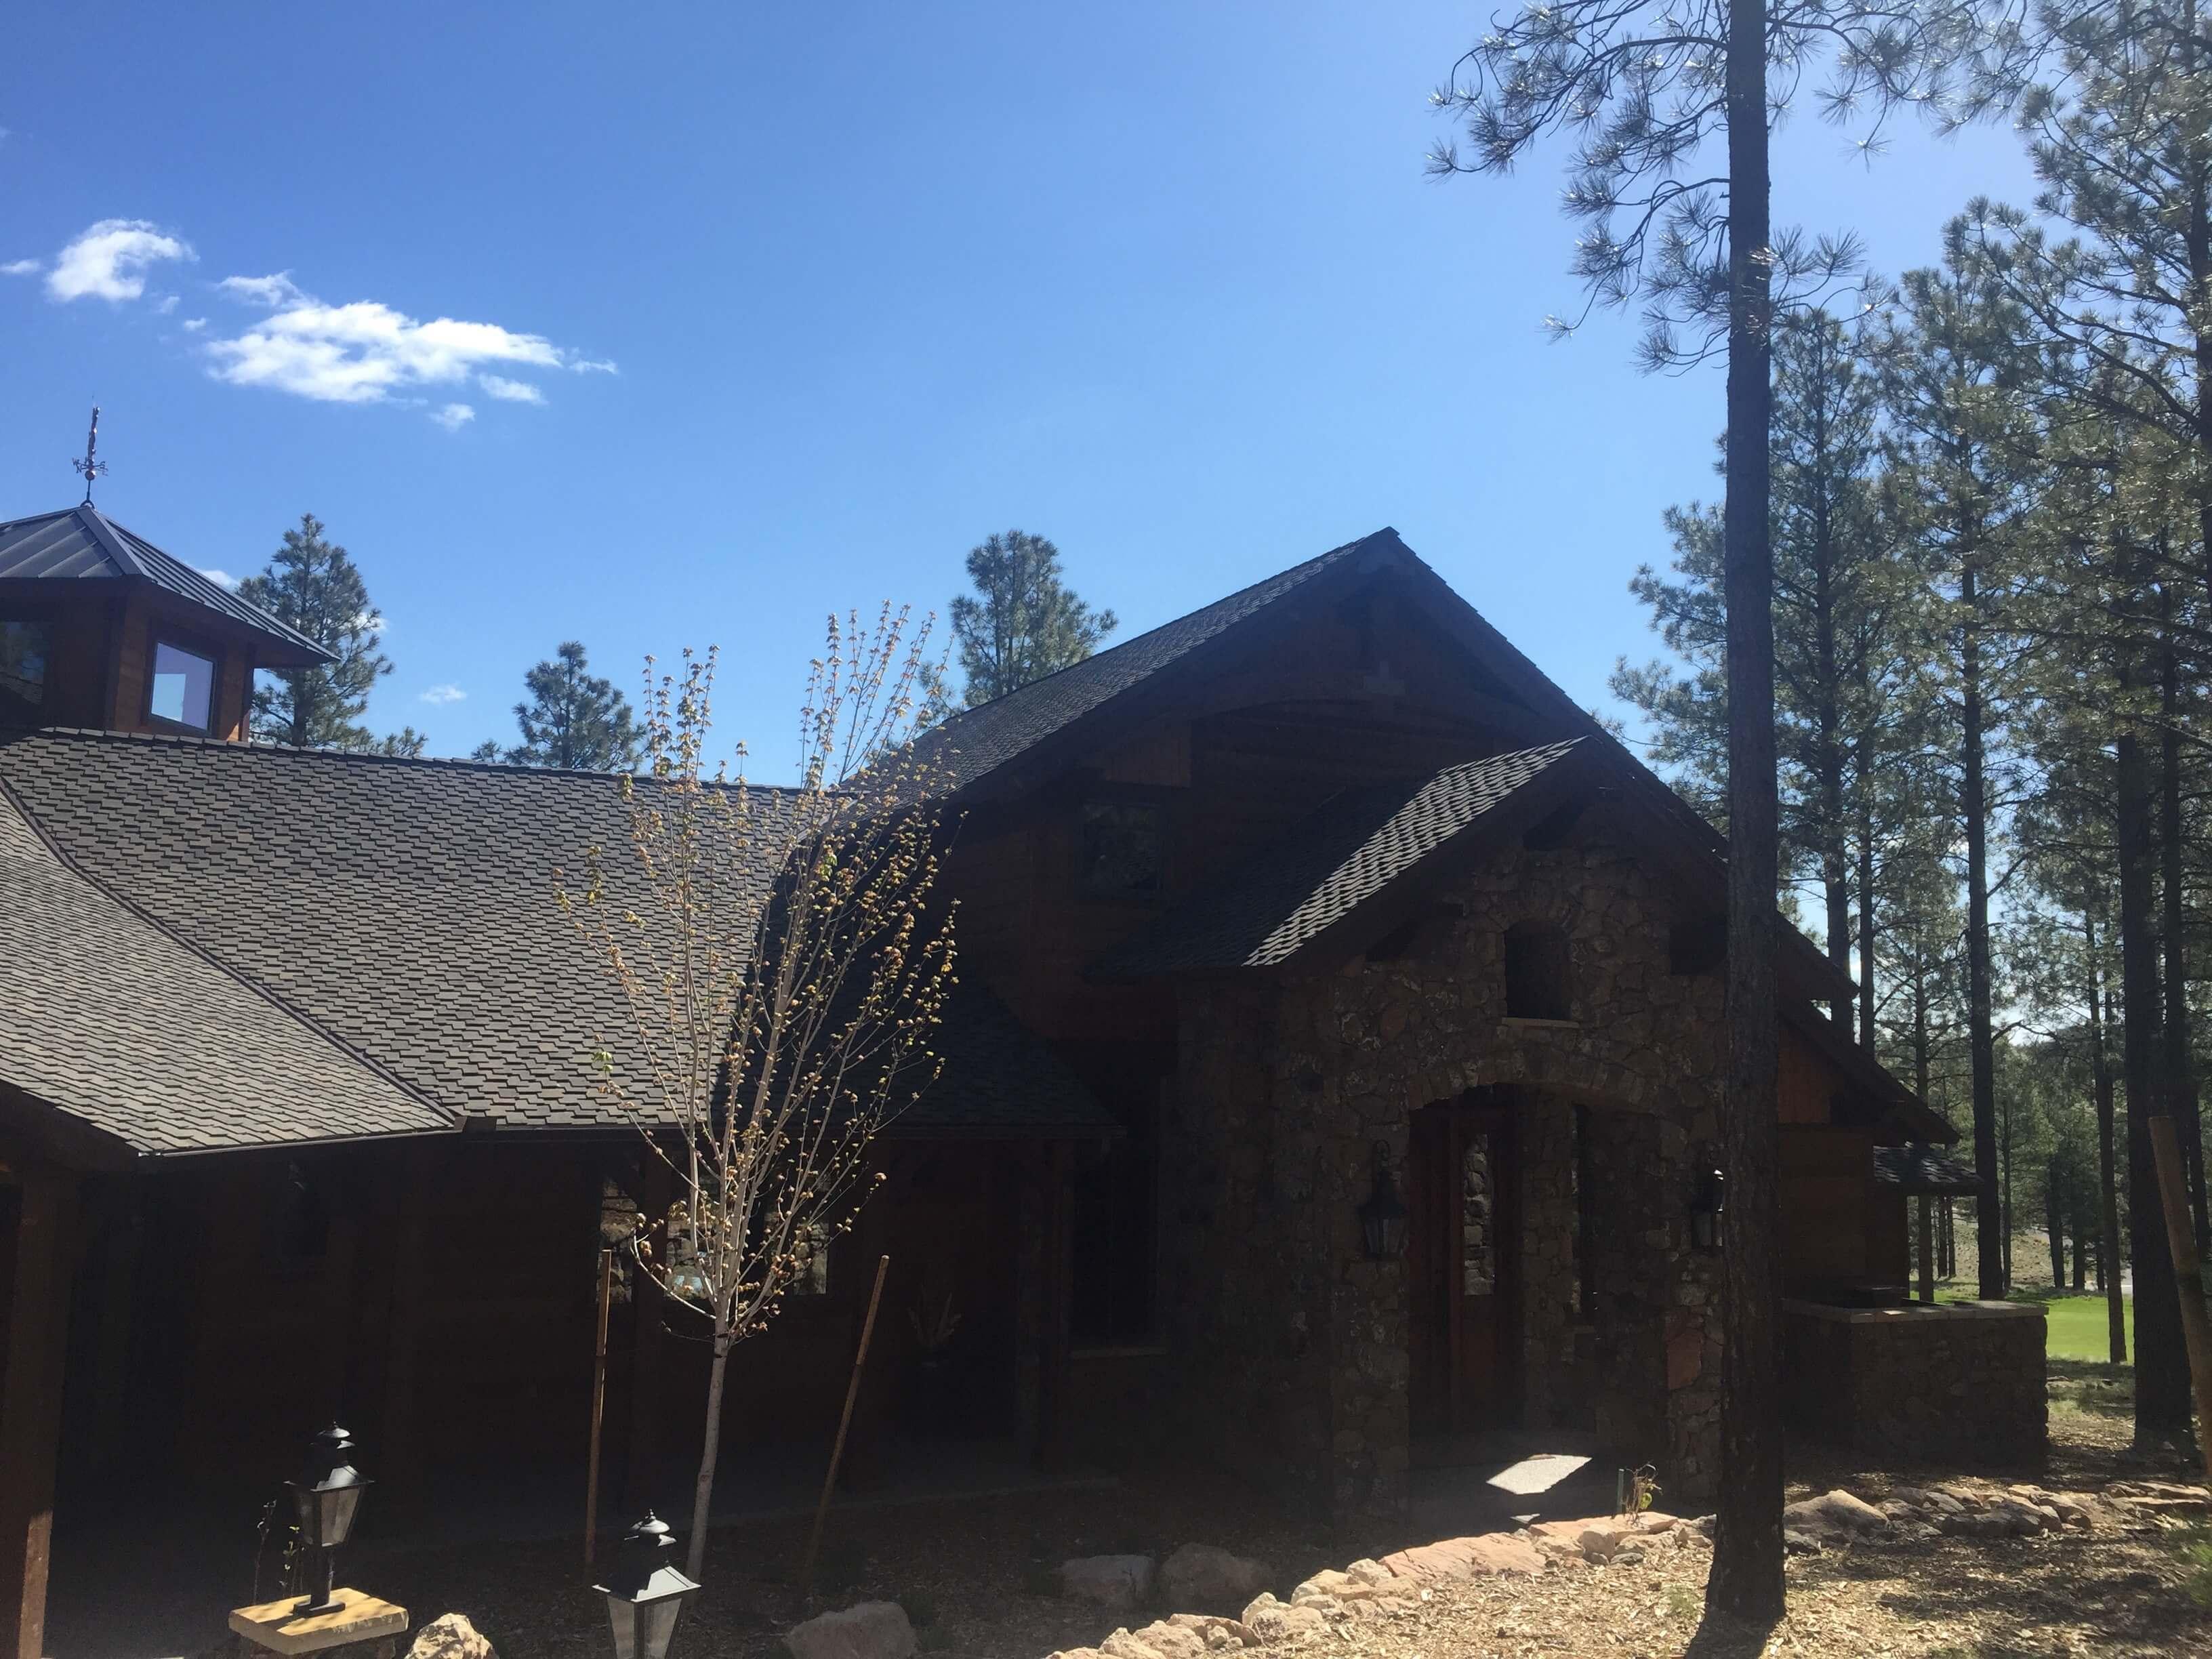 Shingle roofing 2